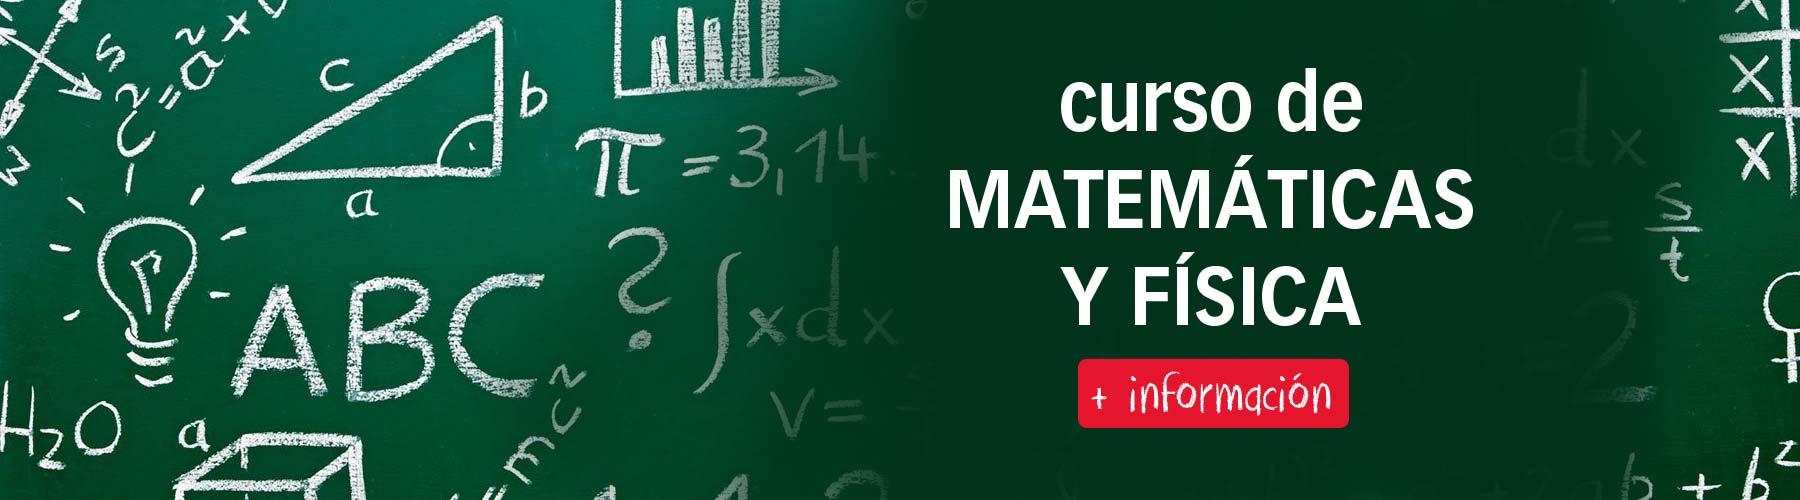 curso-matematicas-fisica-sevilla